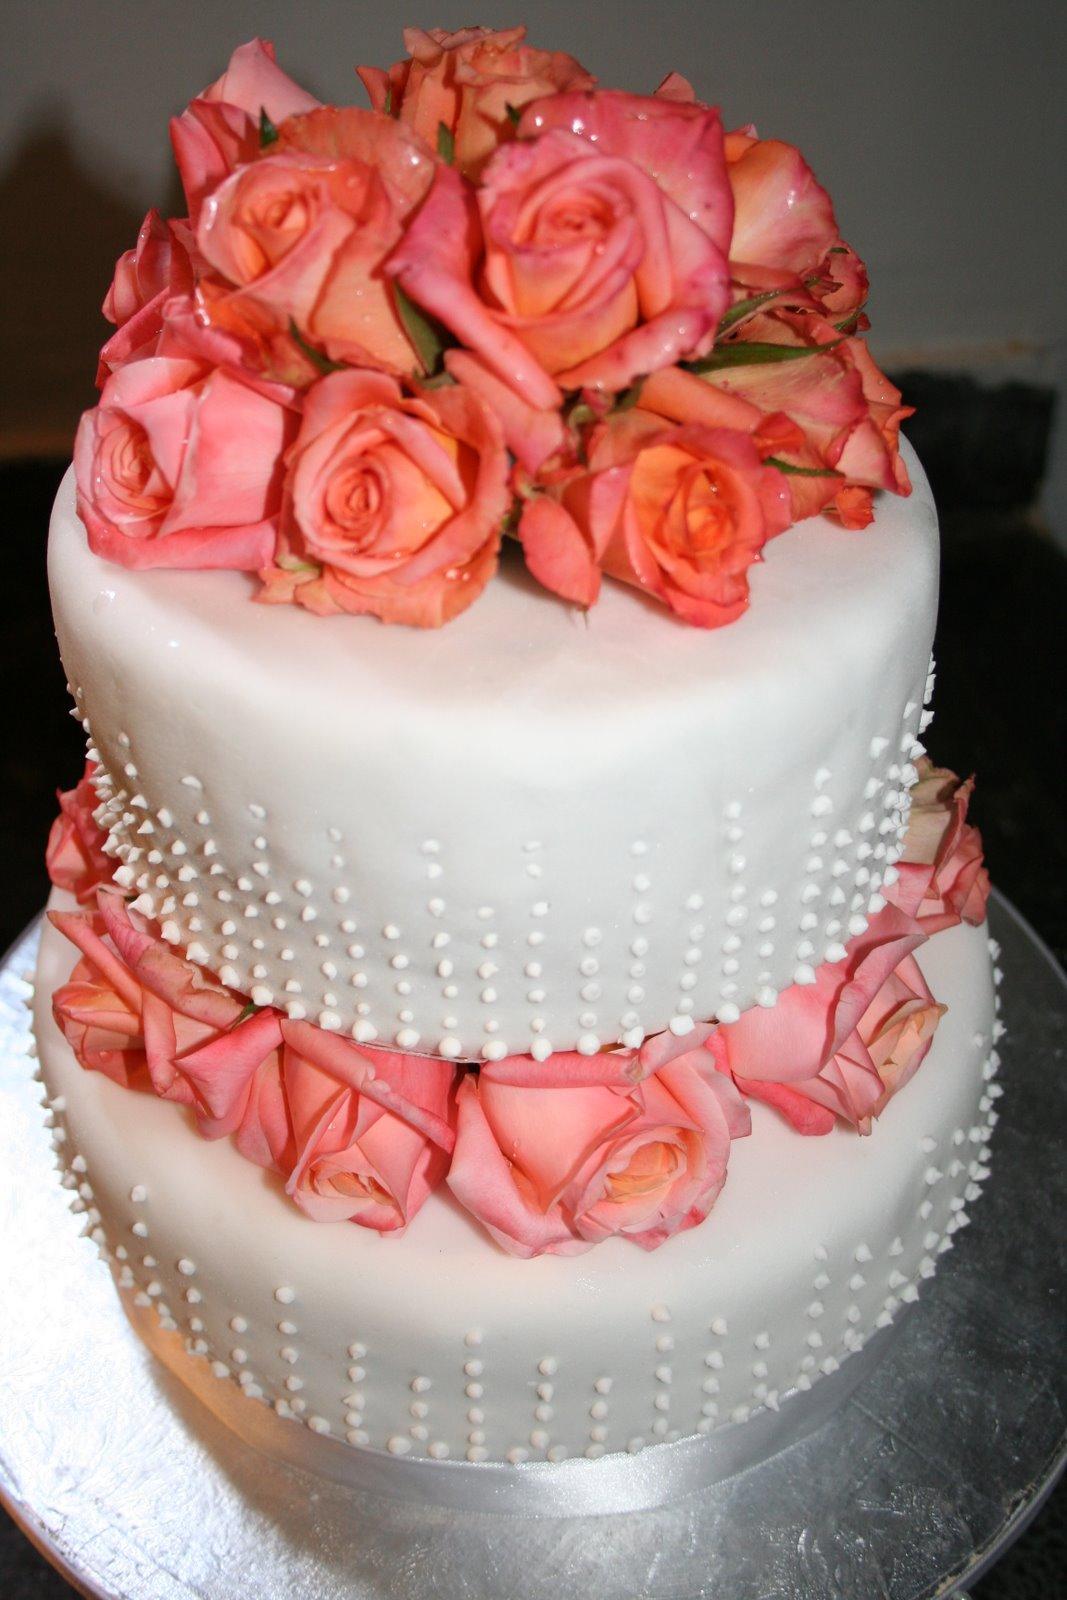 wedding cakes prices, Deepaks blog groom attire for beach